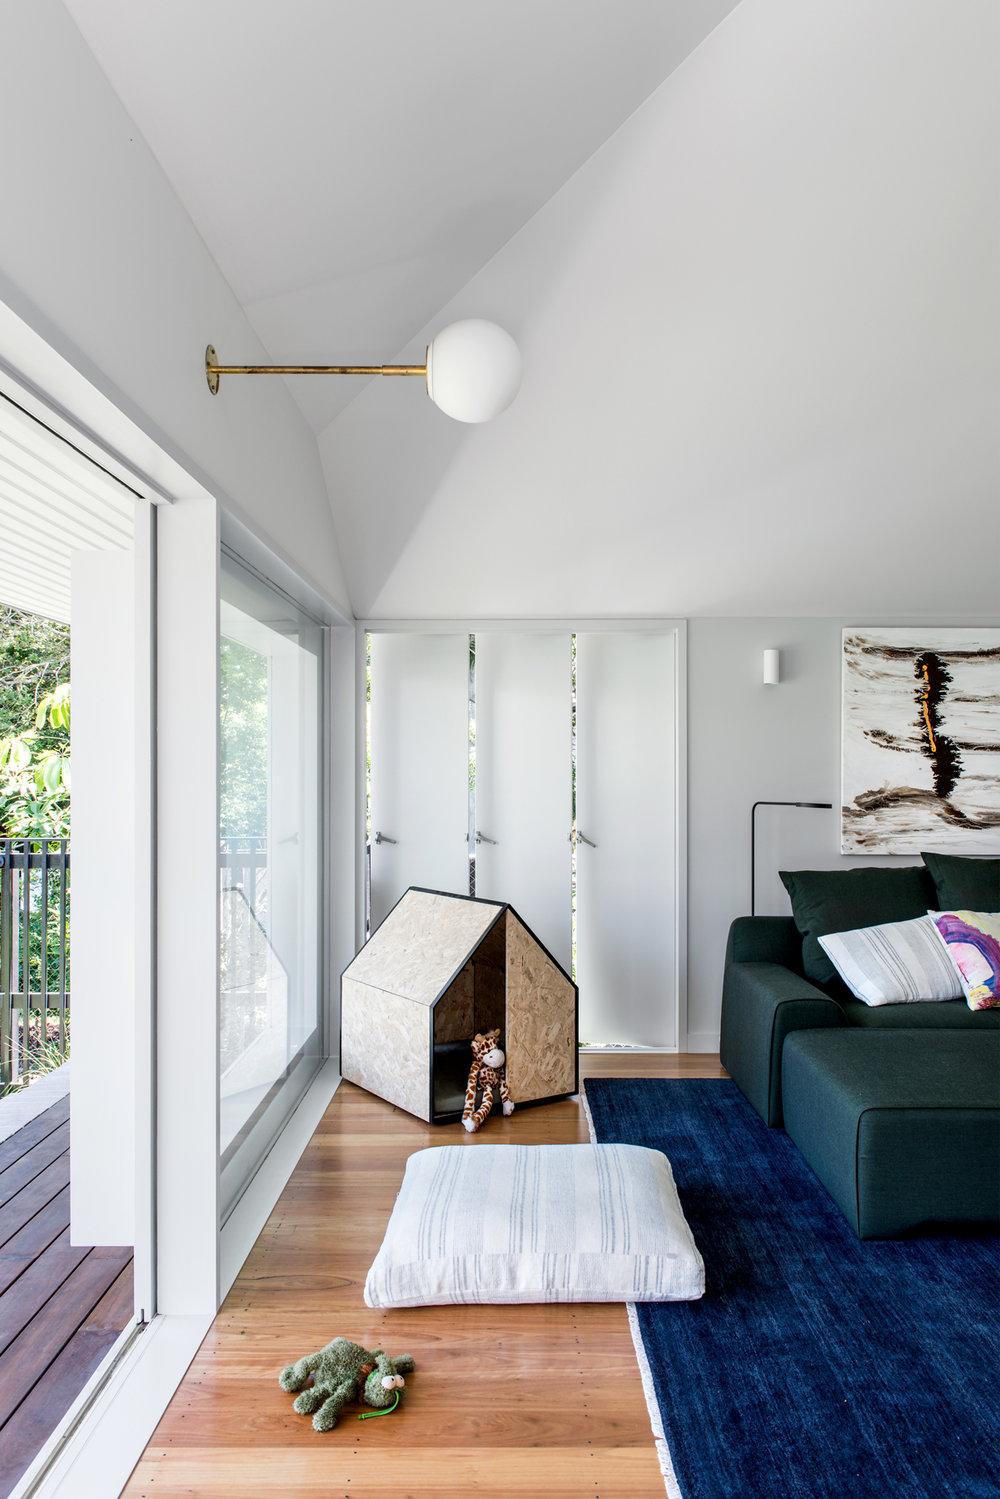 georgia-cannon-interior-designer-brisbane-rawson-house_08_S.jpg